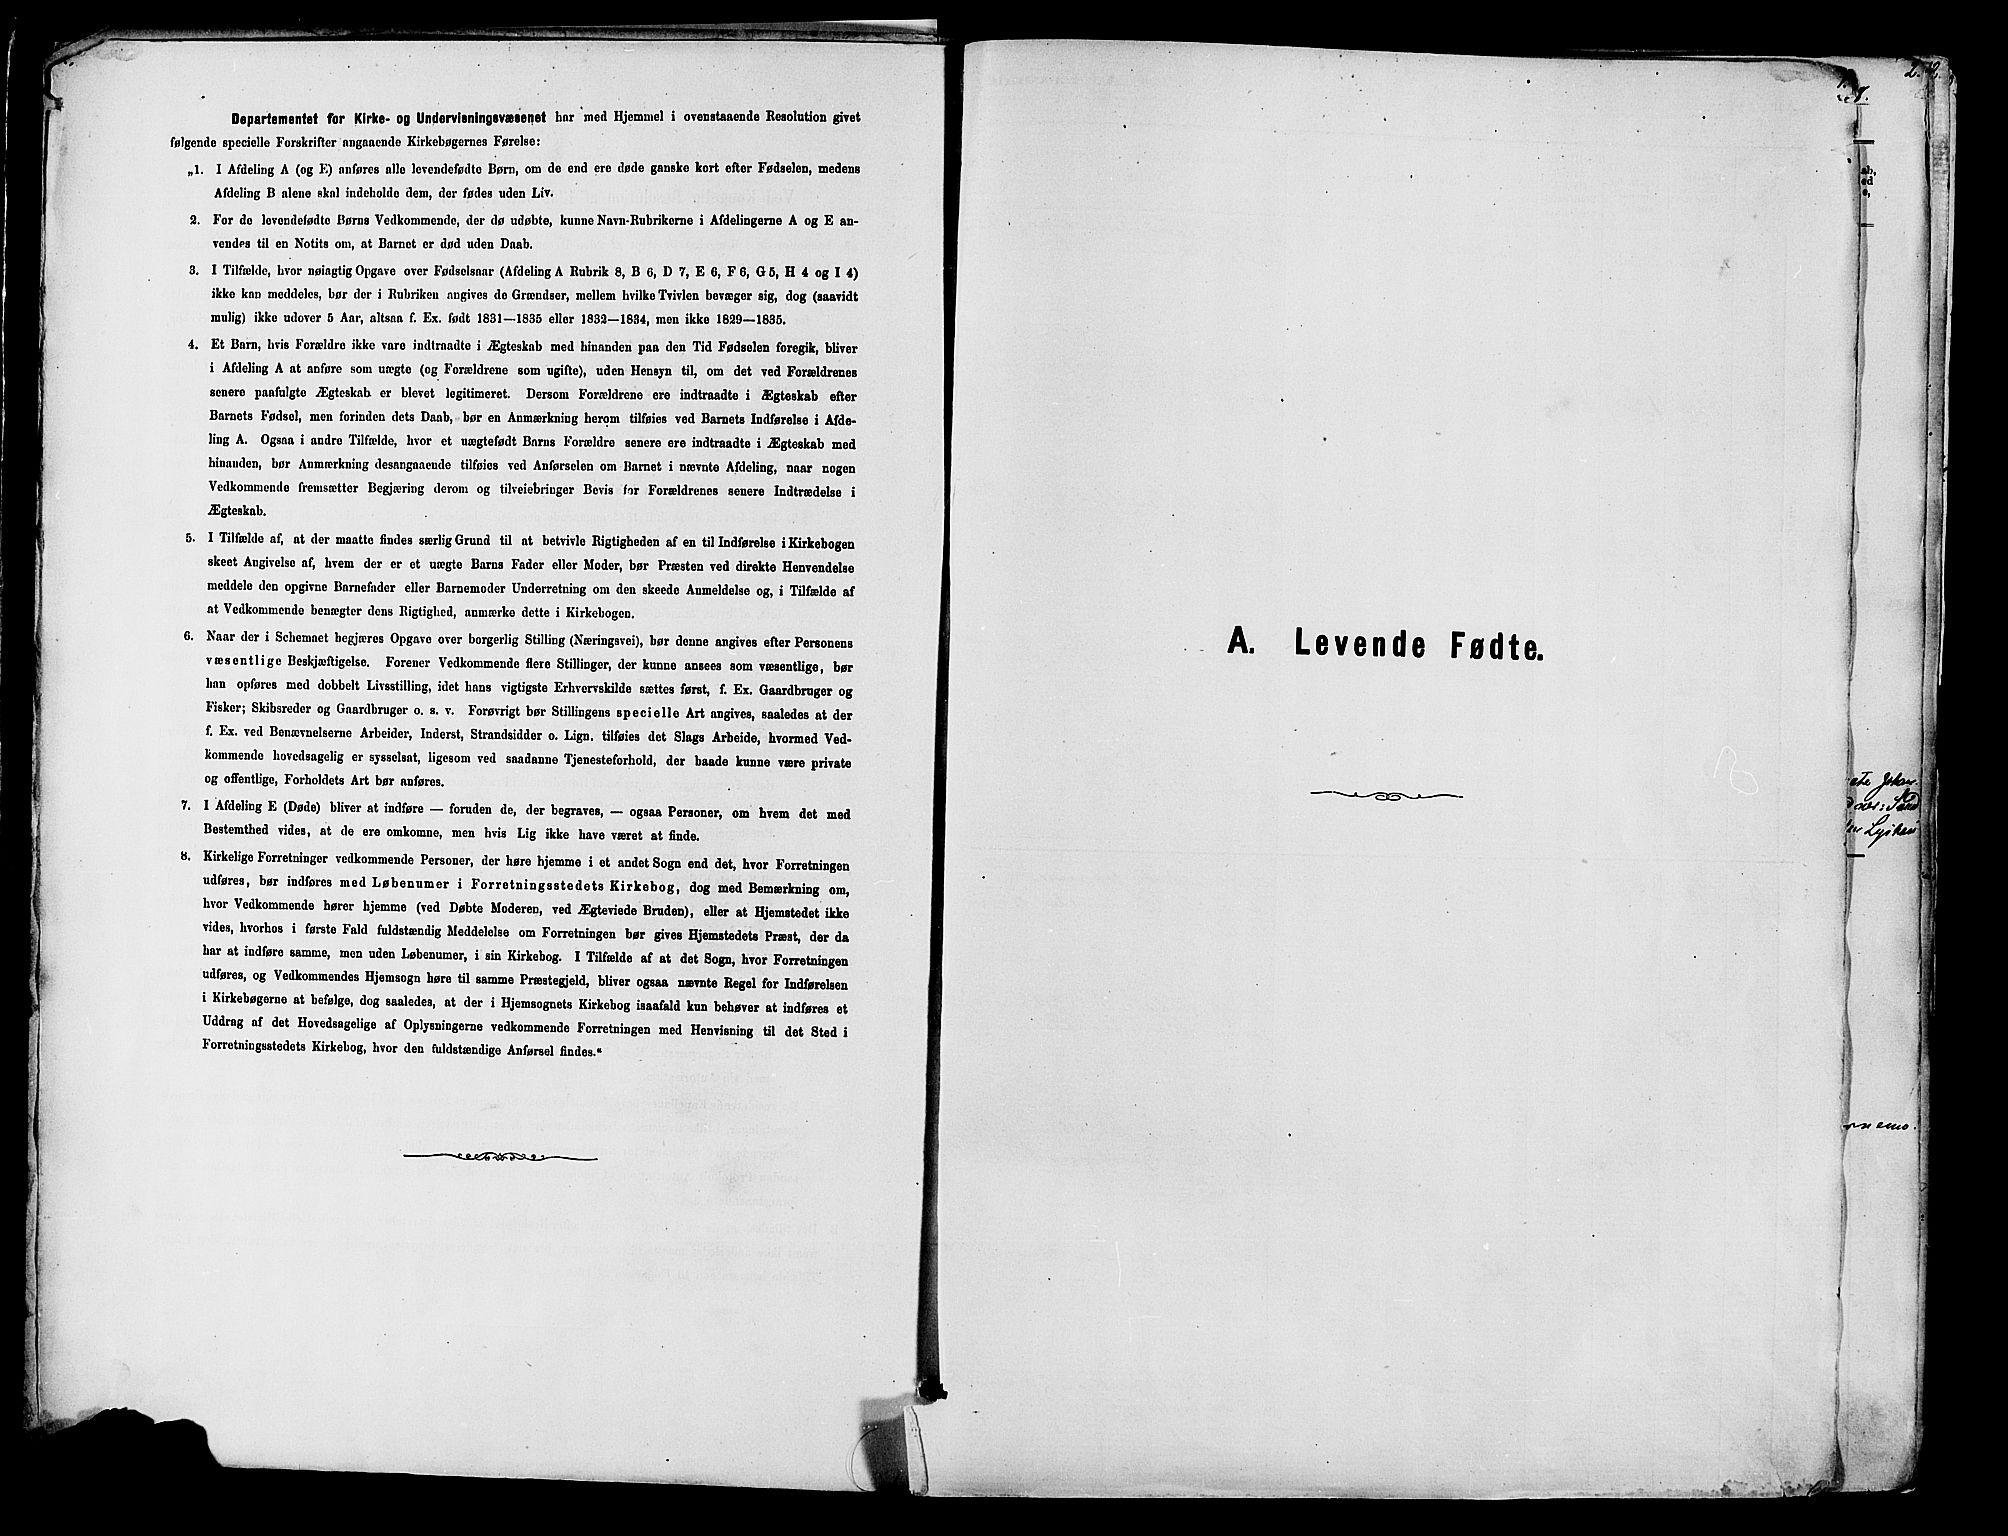 SAH, Vardal prestekontor, H/Ha/Haa/L0010: Ministerialbok nr. 10, 1878-1893, s. 1